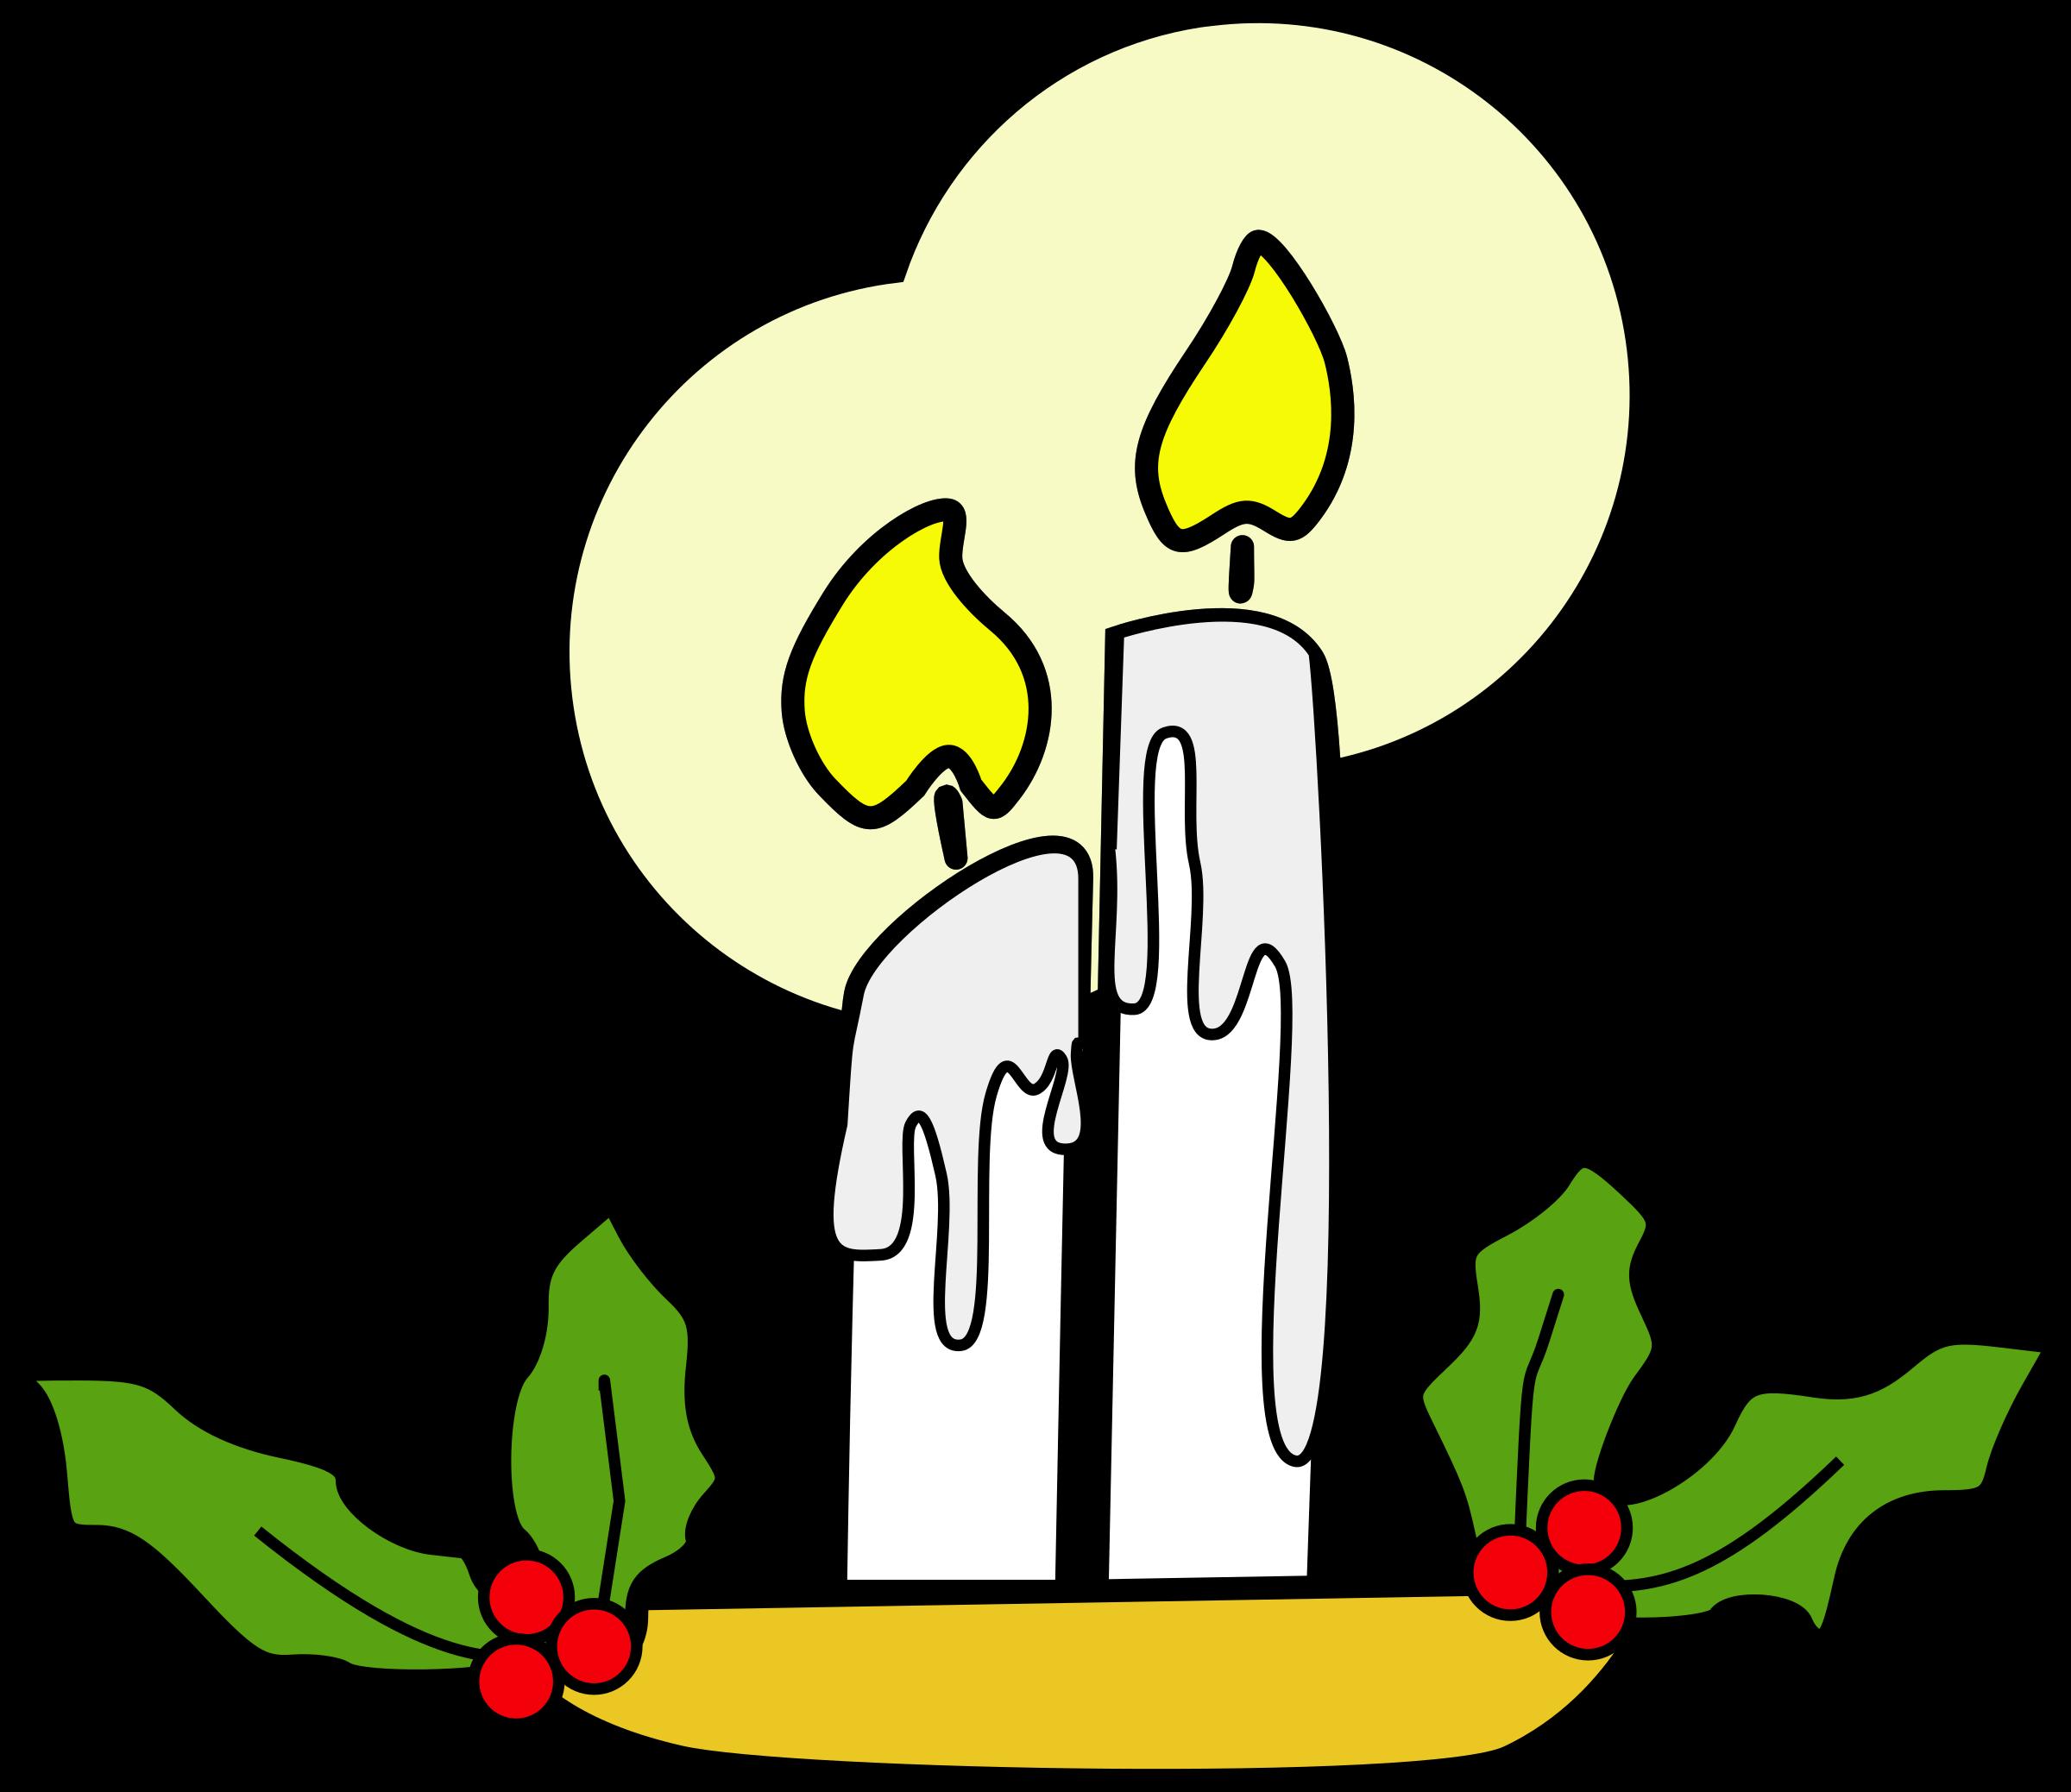 Christmas candles clipart clip transparent stock Clipart - Christmas candles clip transparent stock